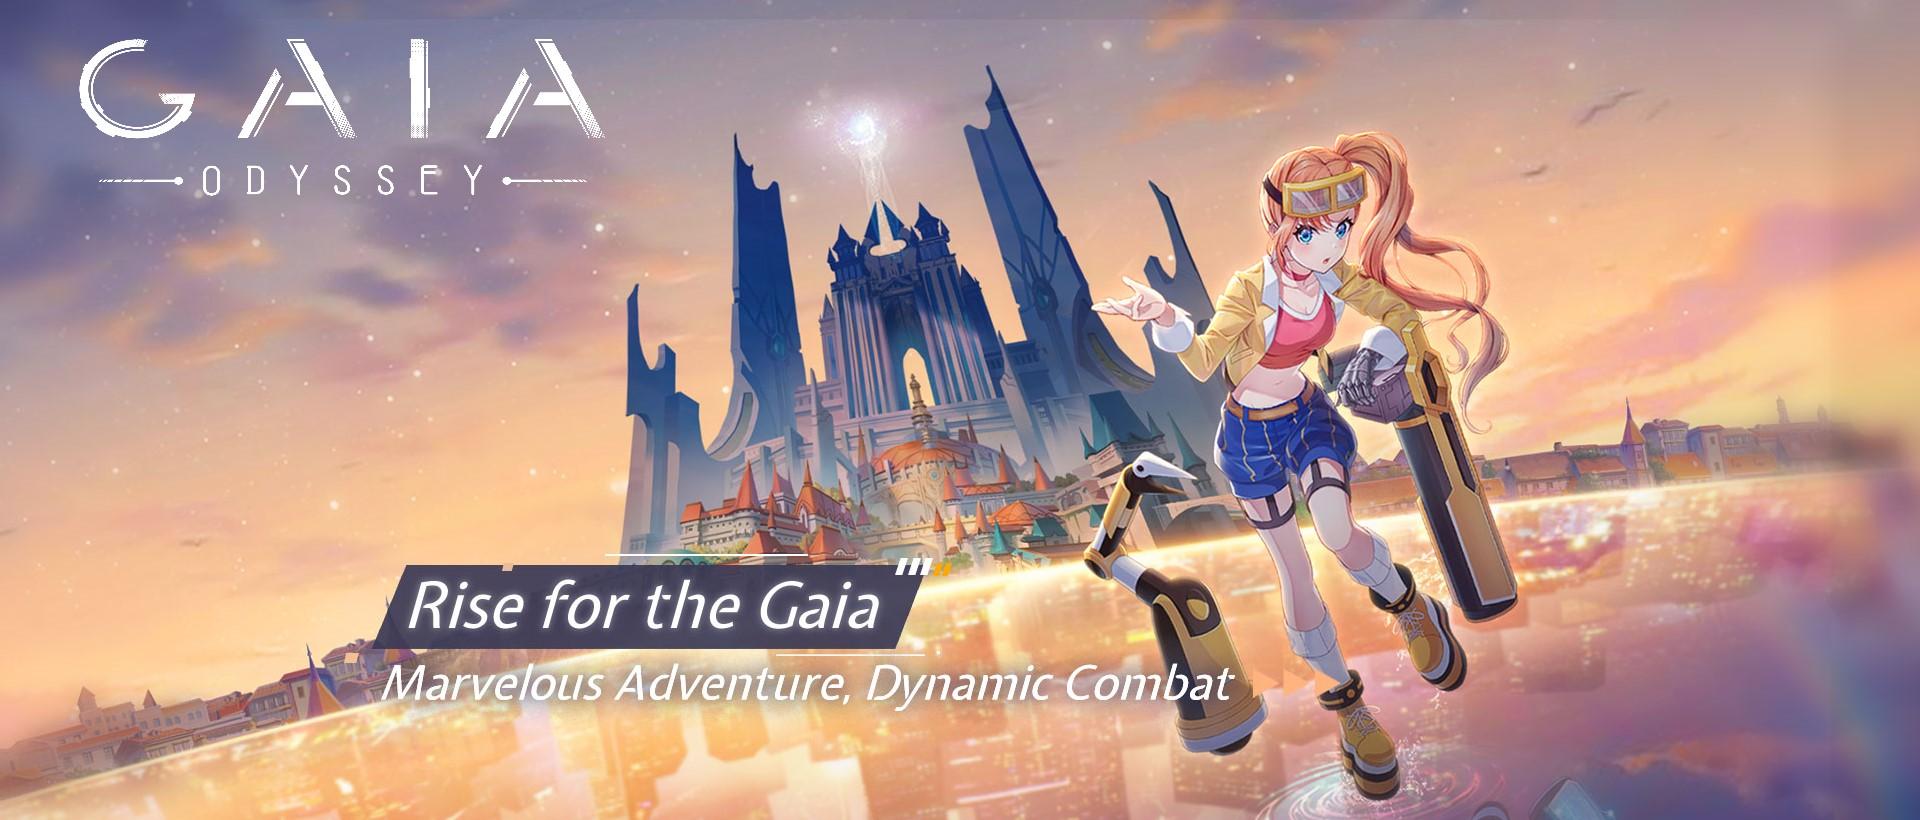 Gaia Odyssey